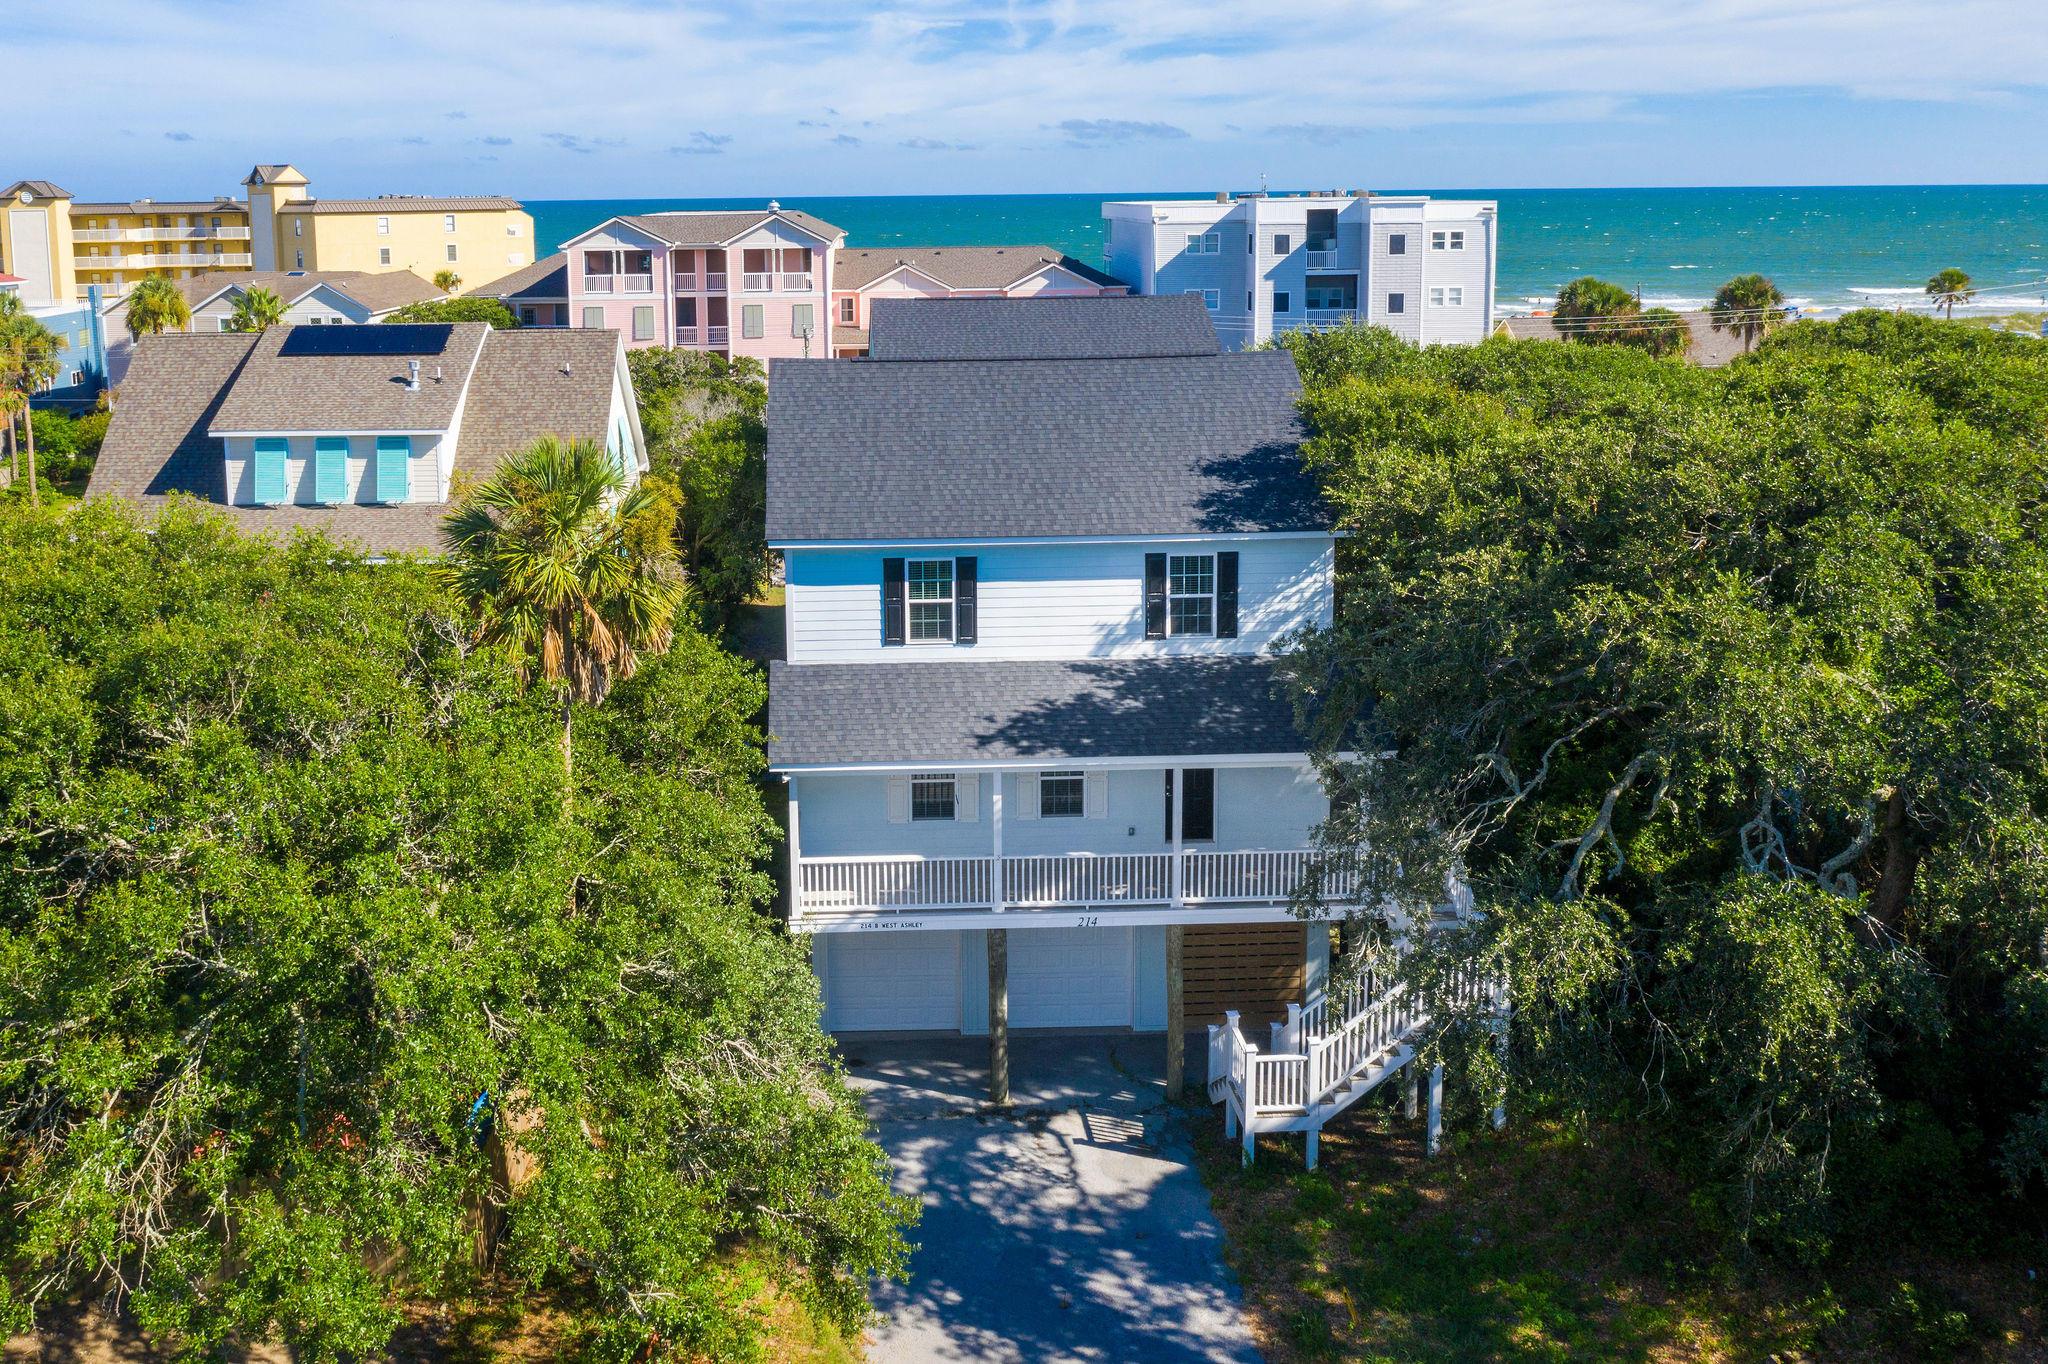 214 Cooper Avenue Folly Beach $800,000.00